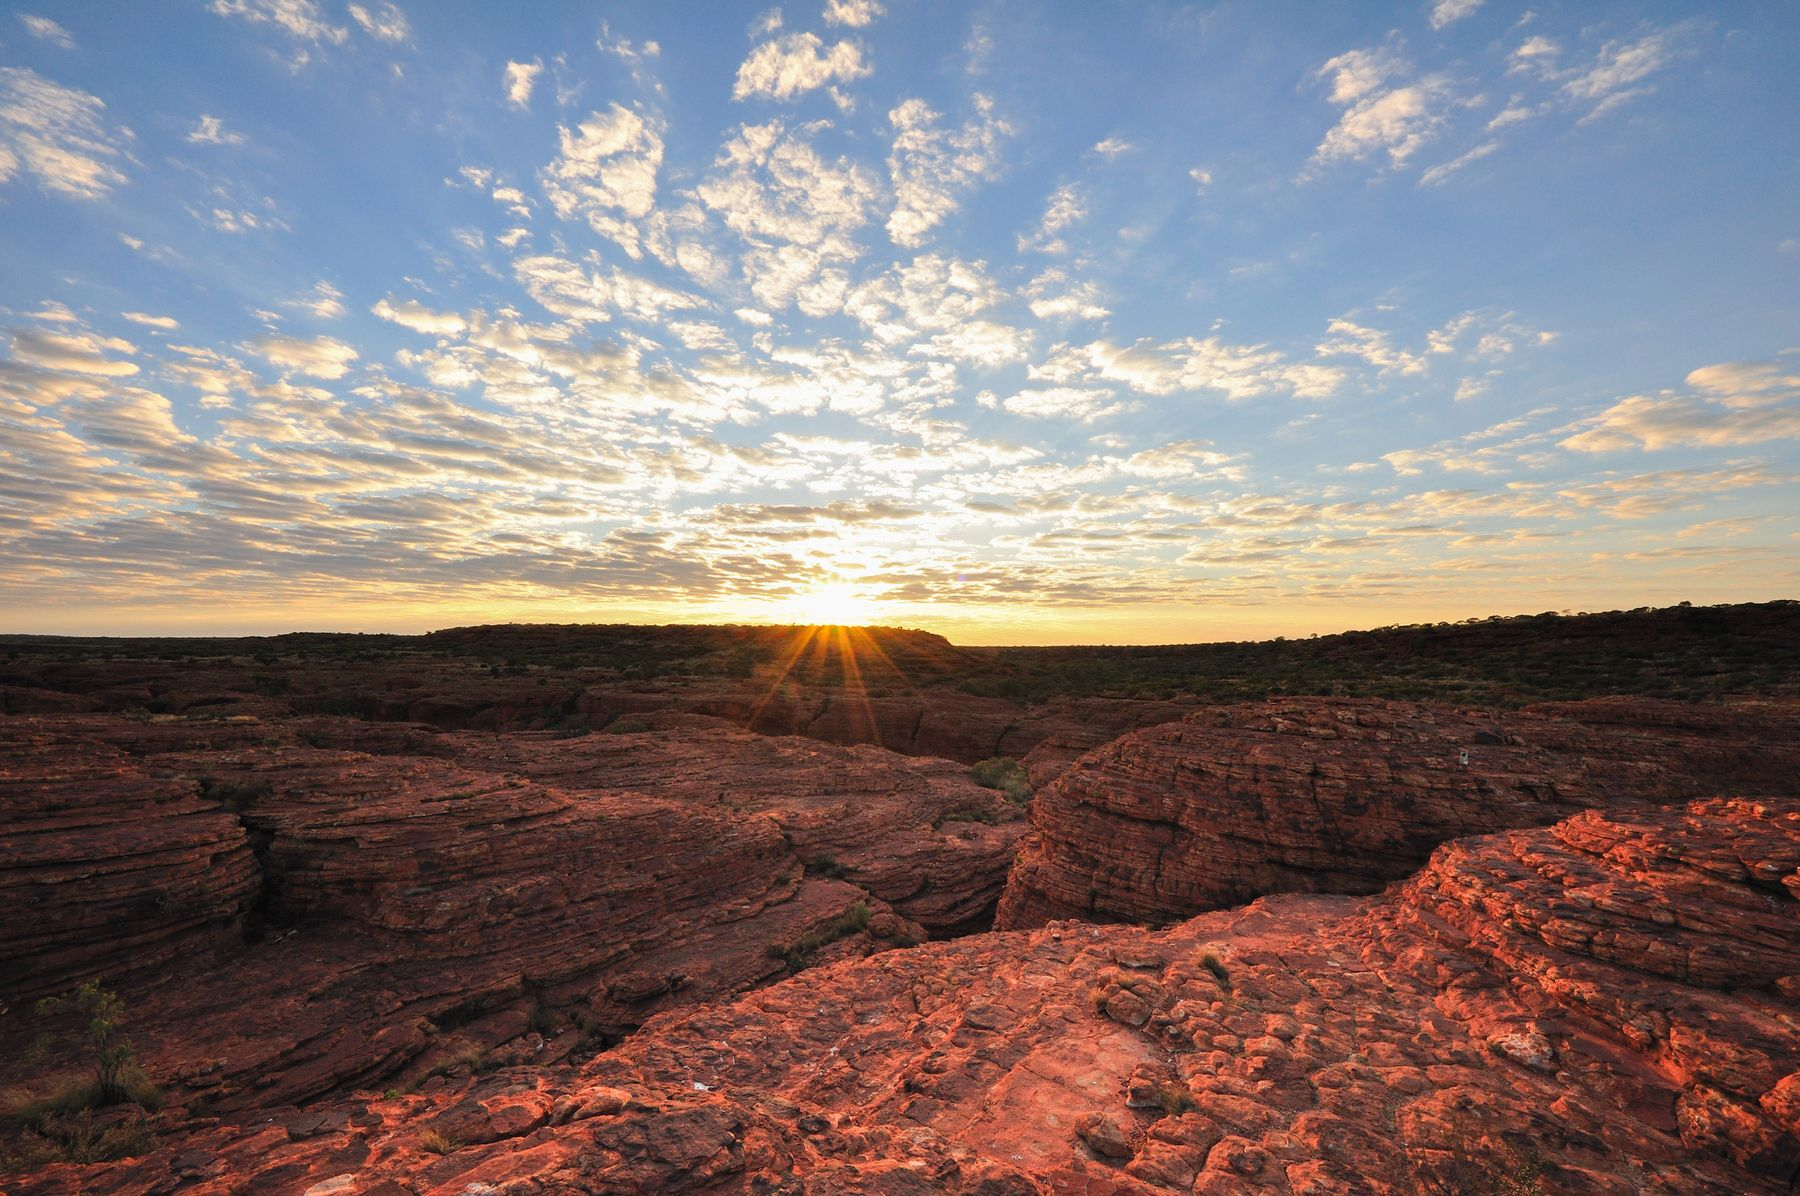 Sun setting over the Australian outback